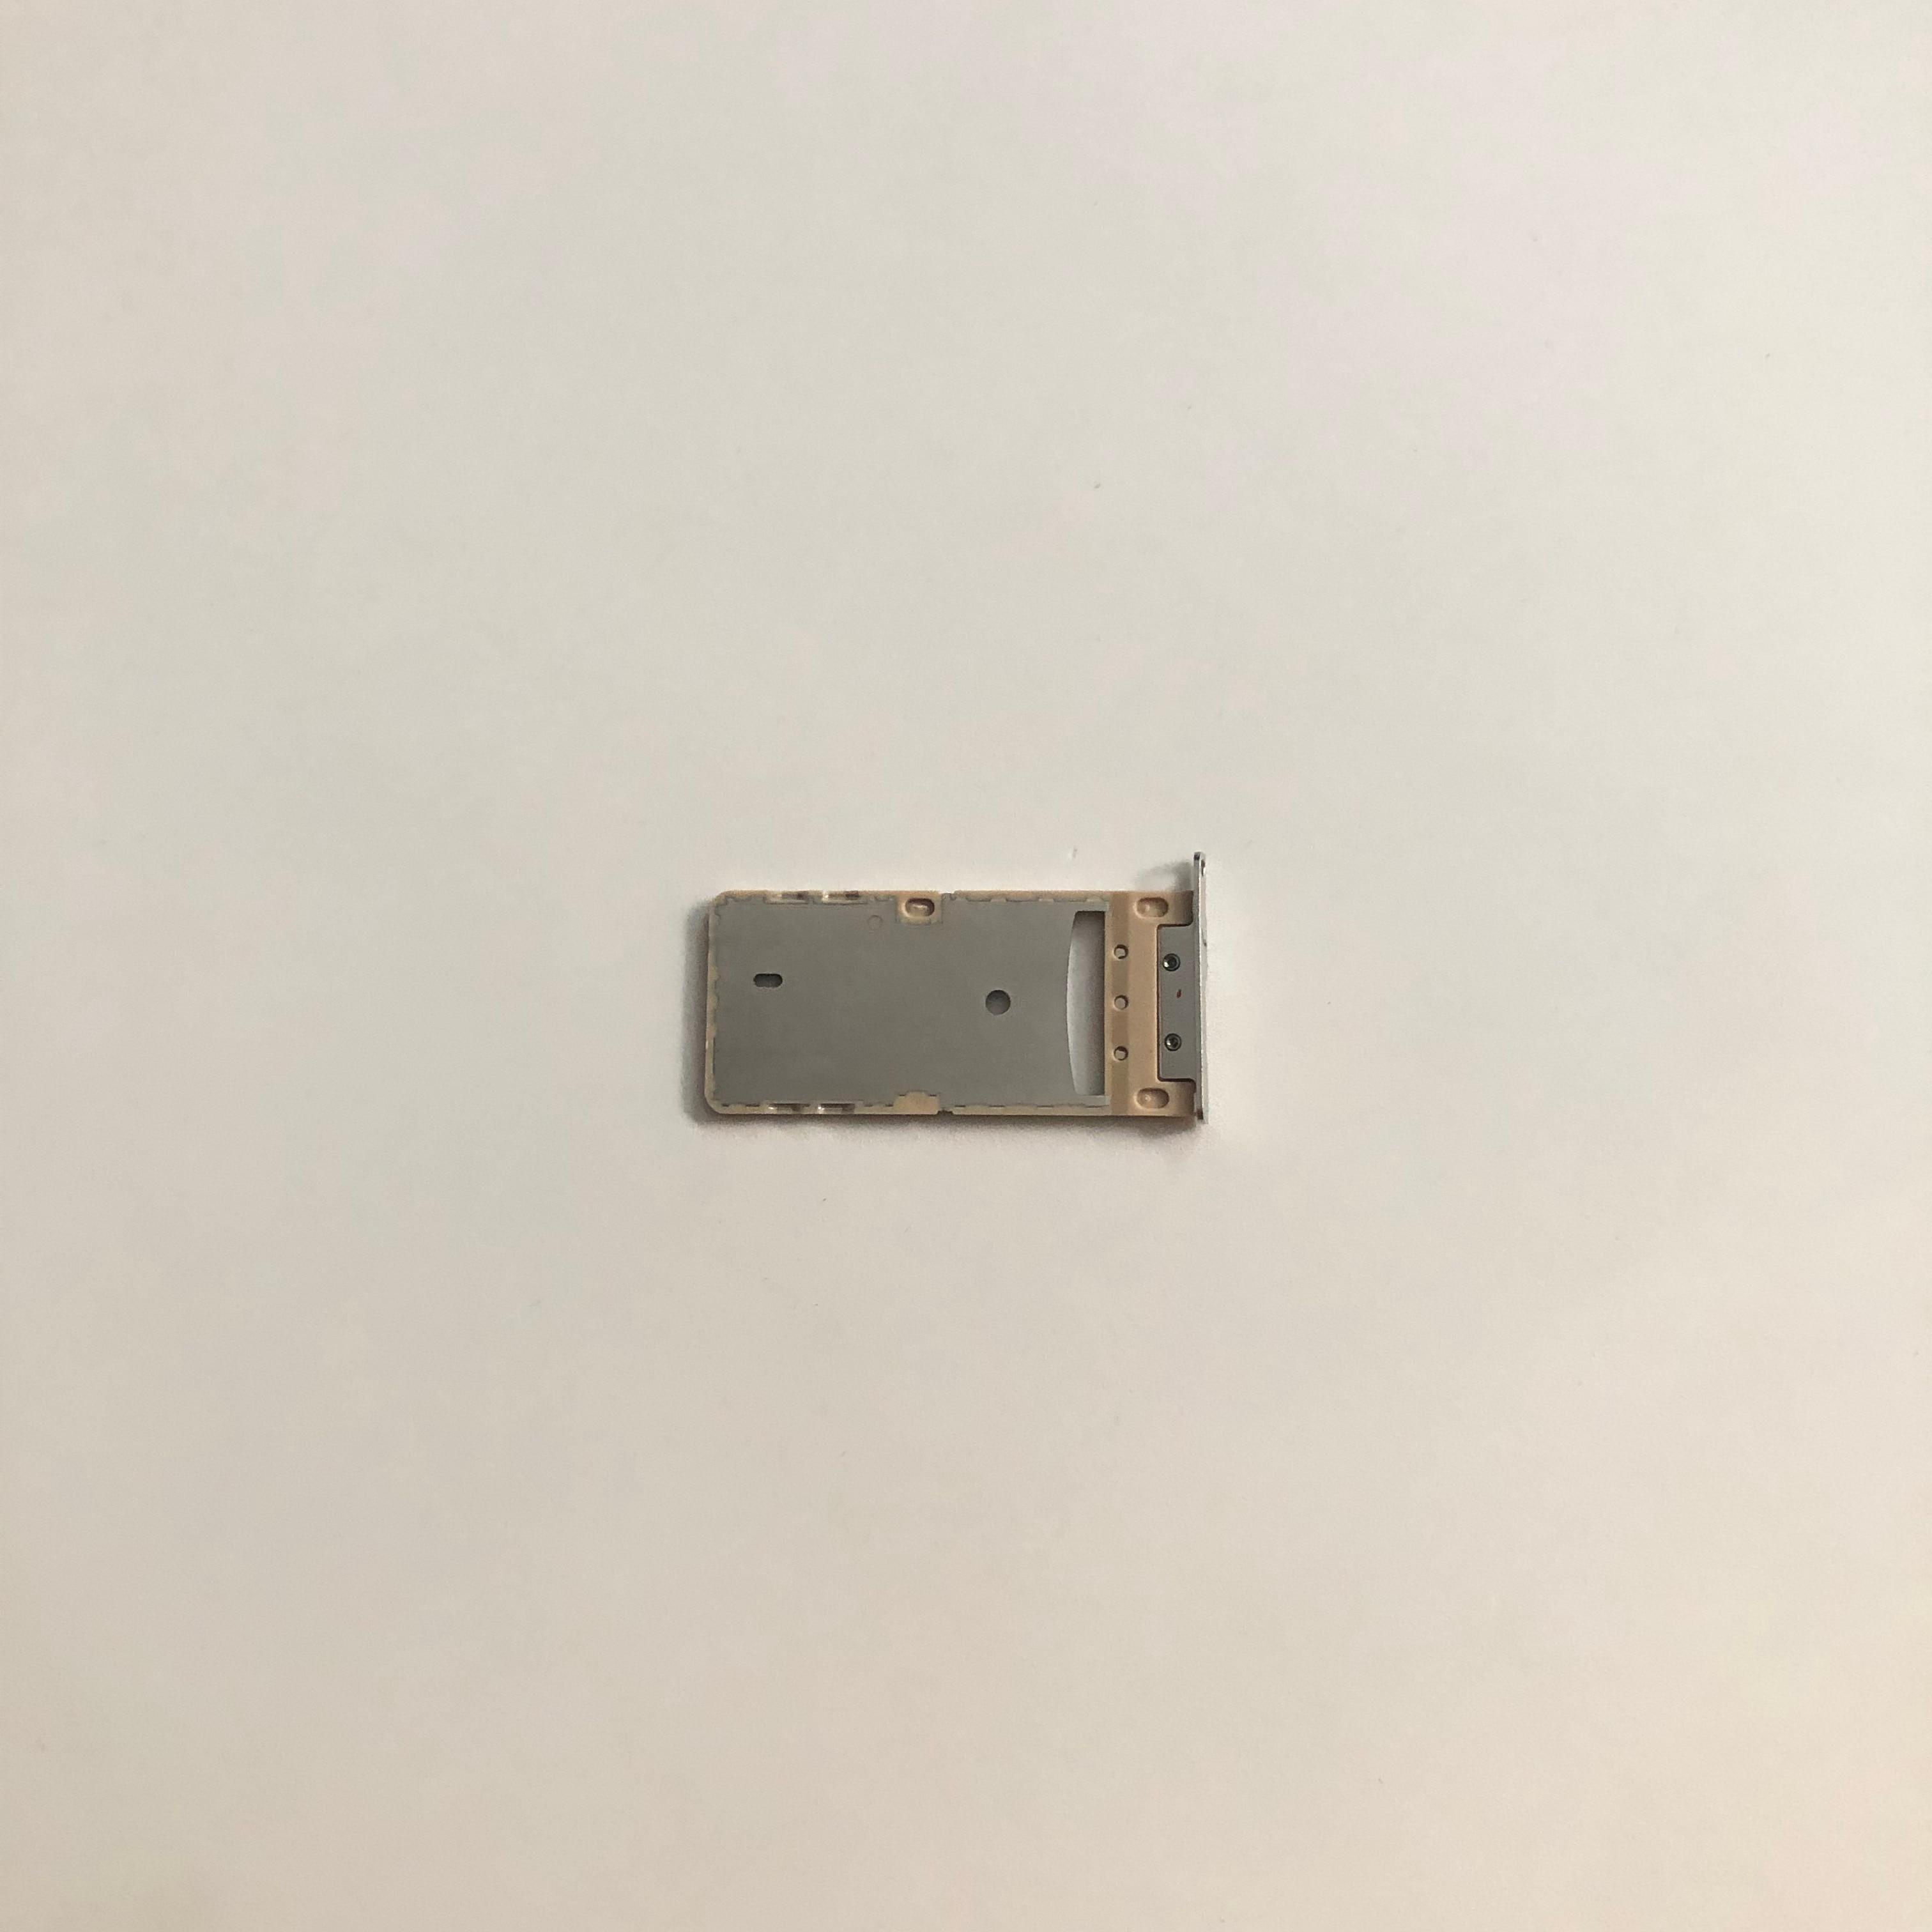 Original Used Sim Card Holder Tray Card Slot For Blackview BV9000 Pro MTK6757CD 5.7